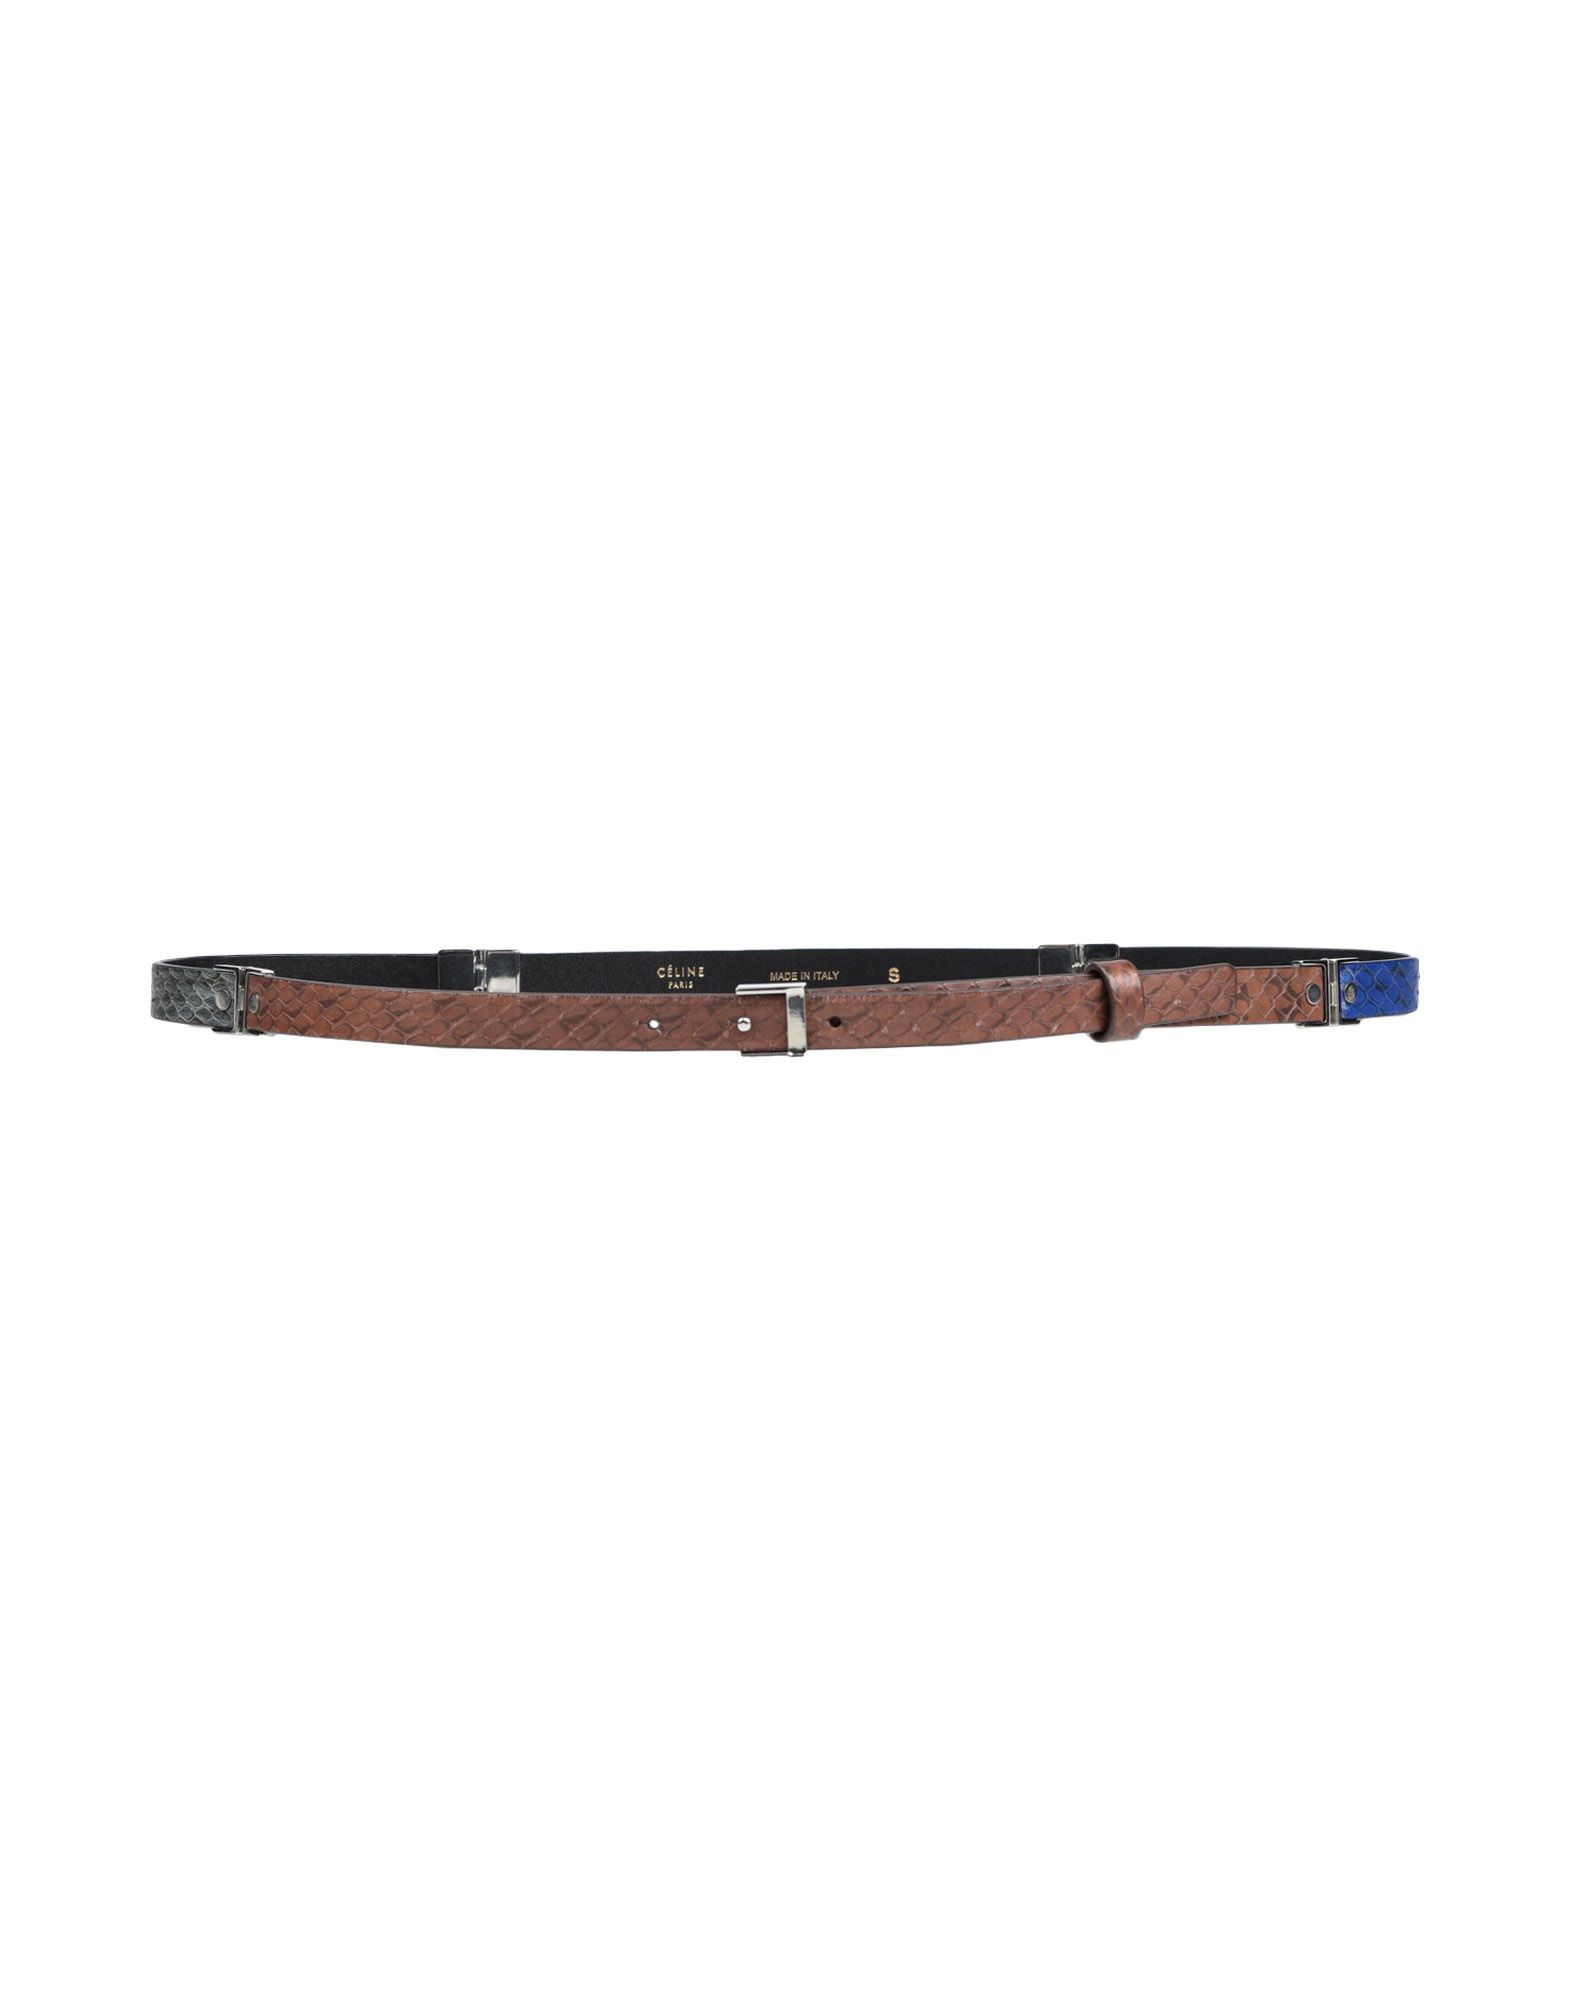 Belts in Brown